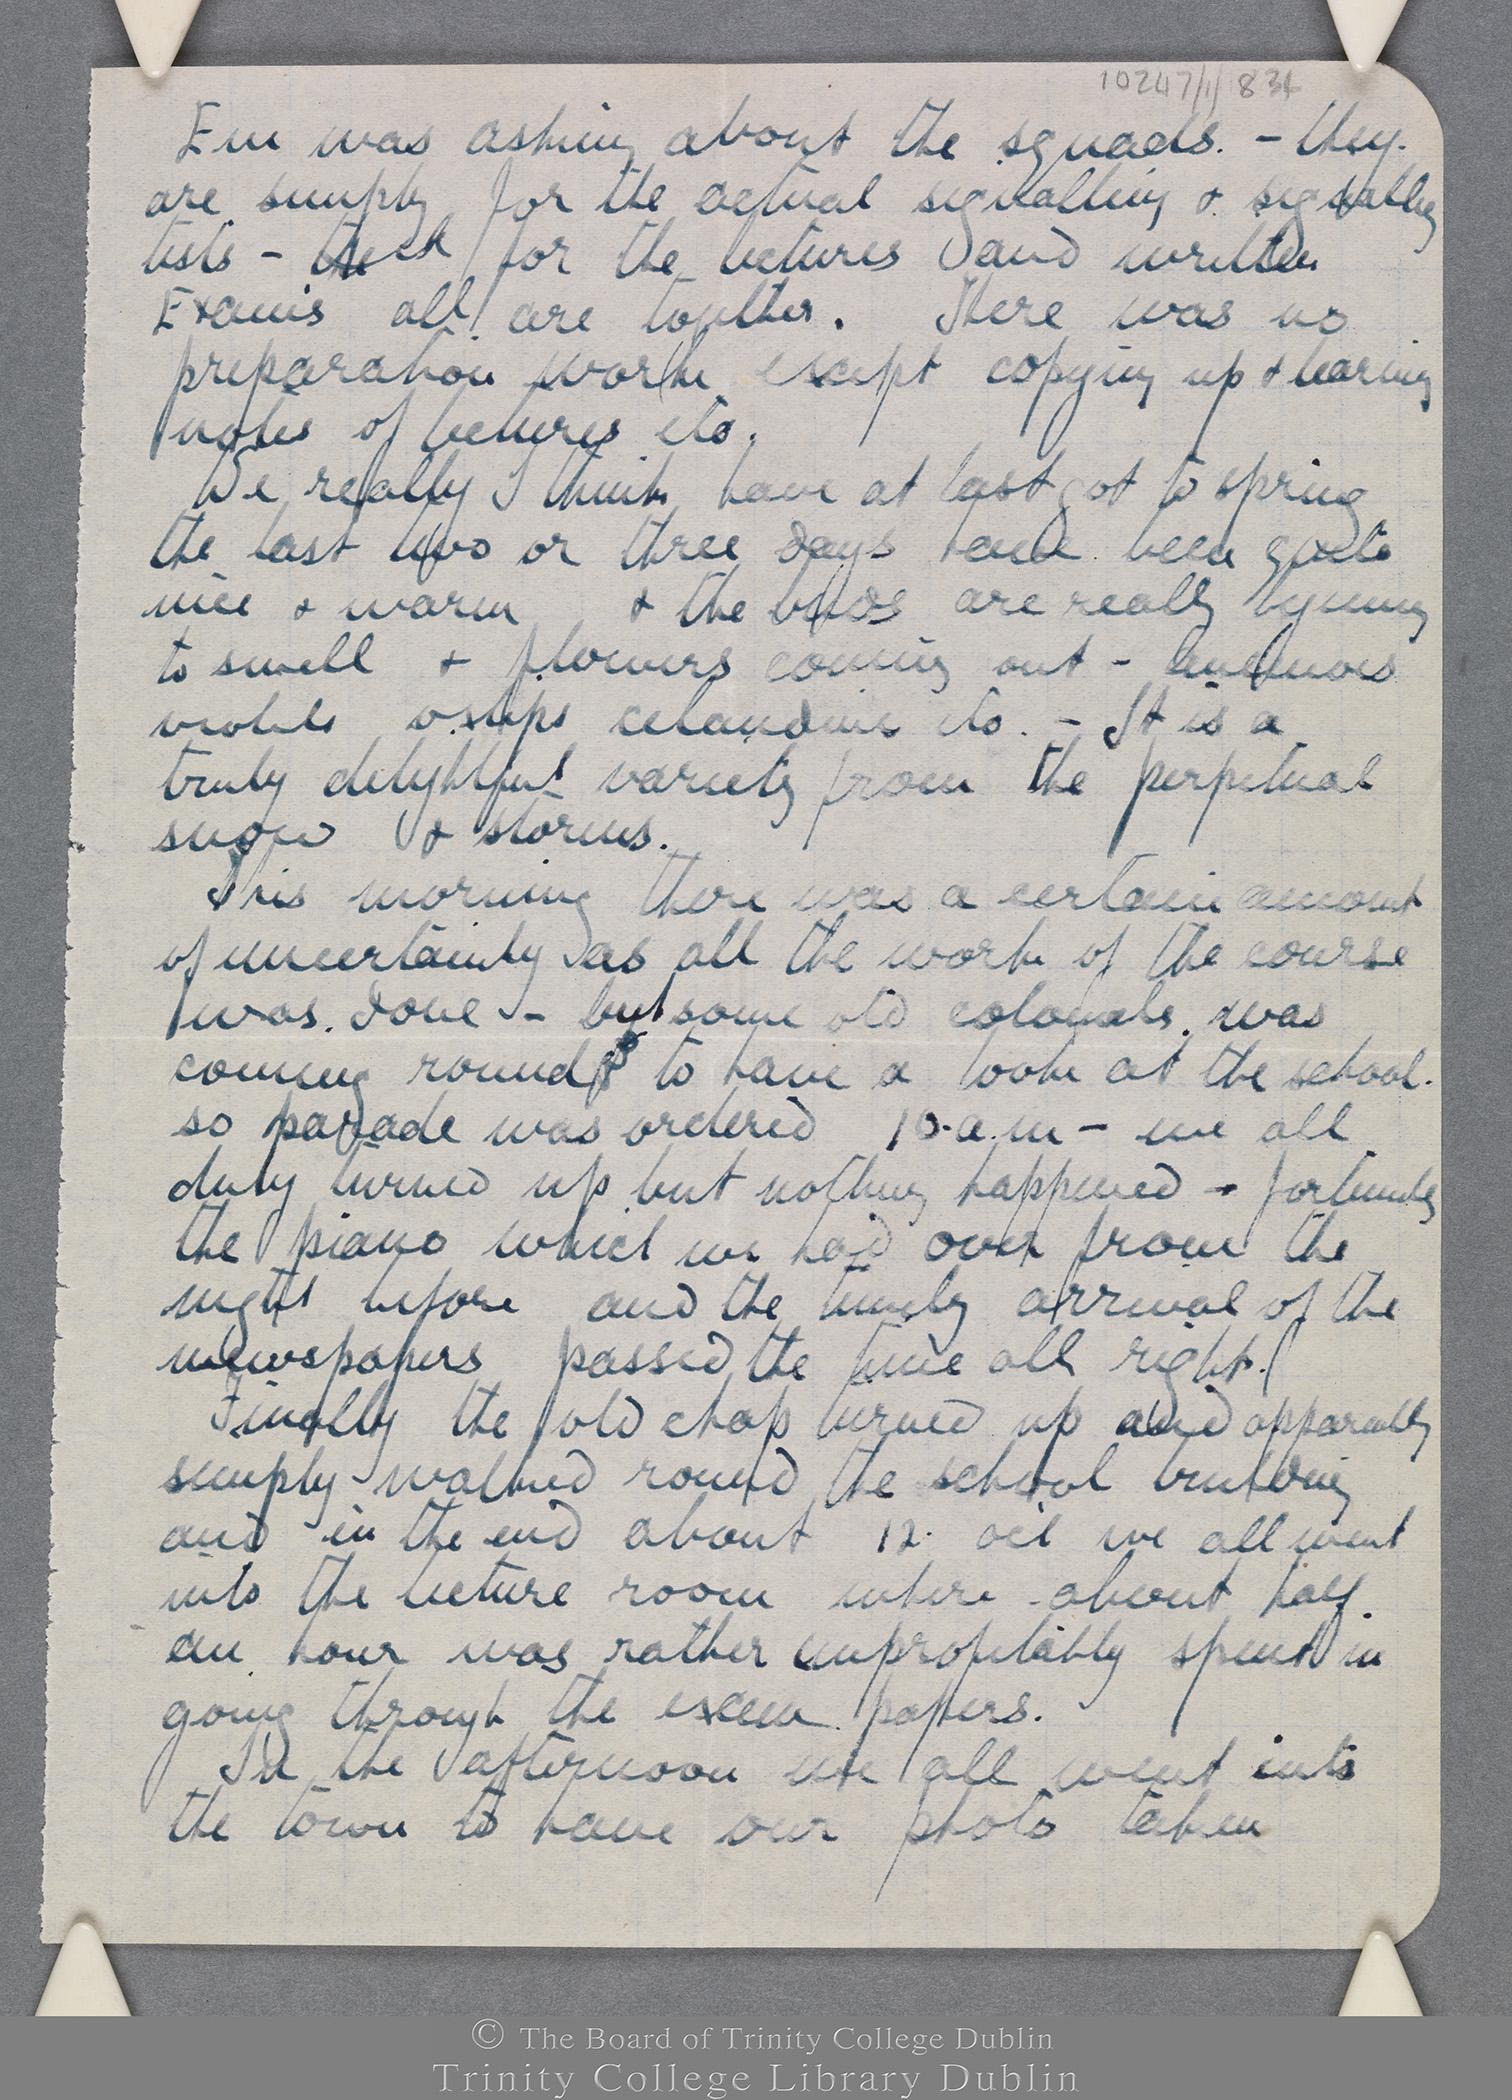 TCD MS 10247/1/834 folio 3 recto